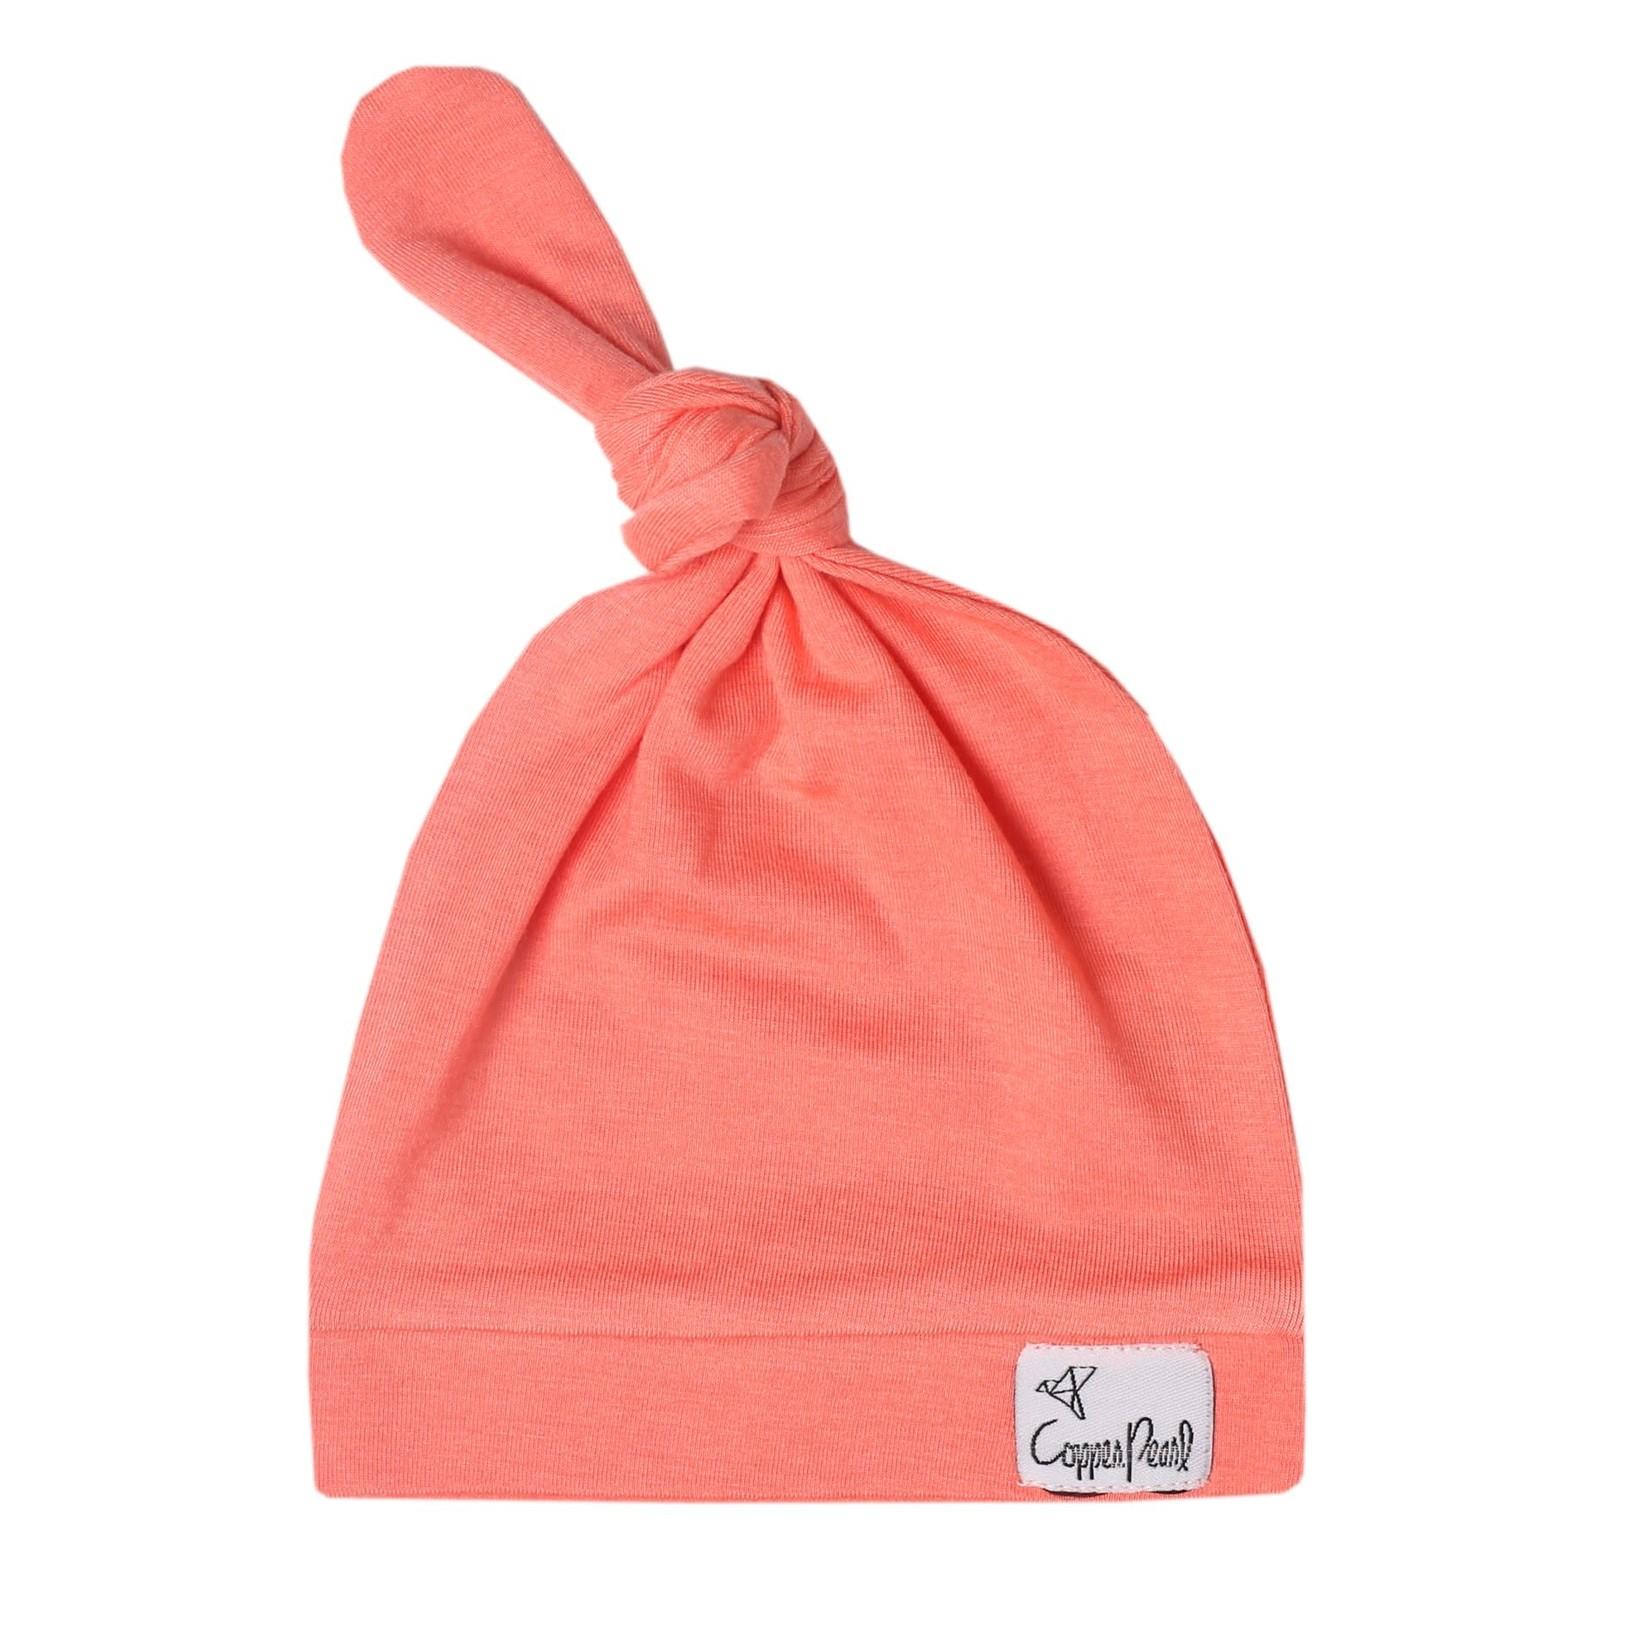 Copper Pearl Newborn Top Knot Hat, Stella